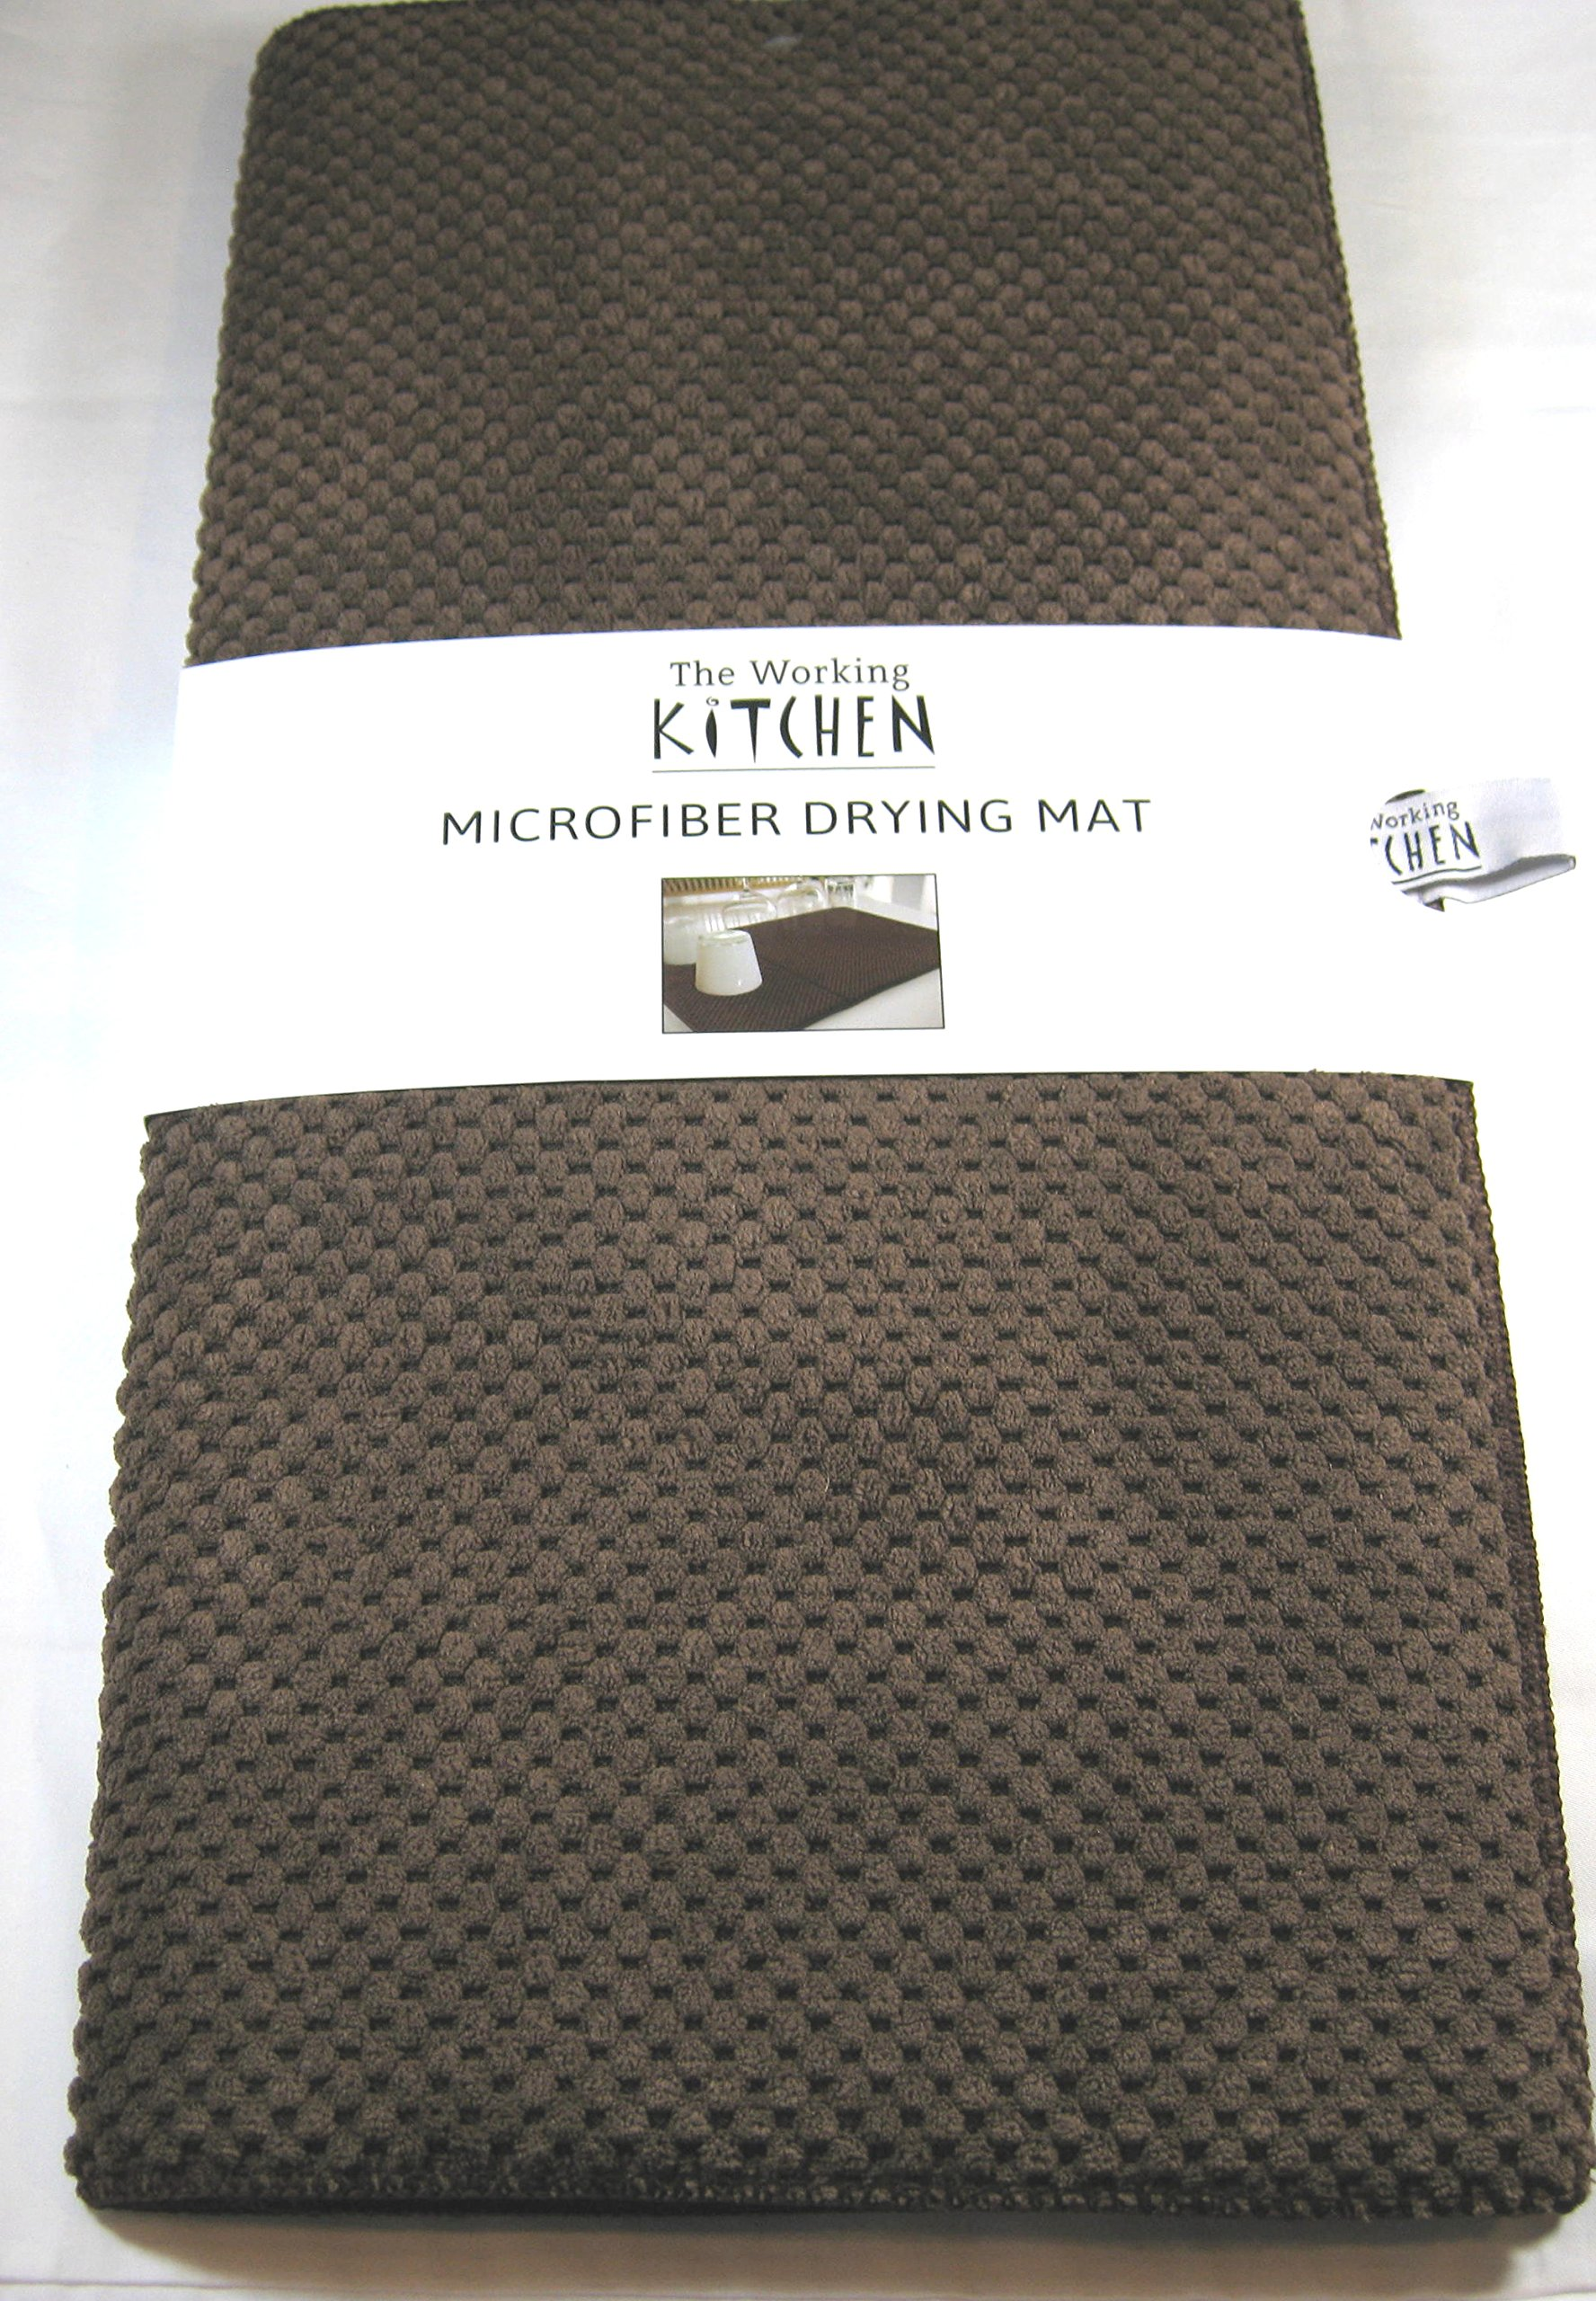 The Working Kitchen Xlarge Microfiber Dish Drying Mat 19